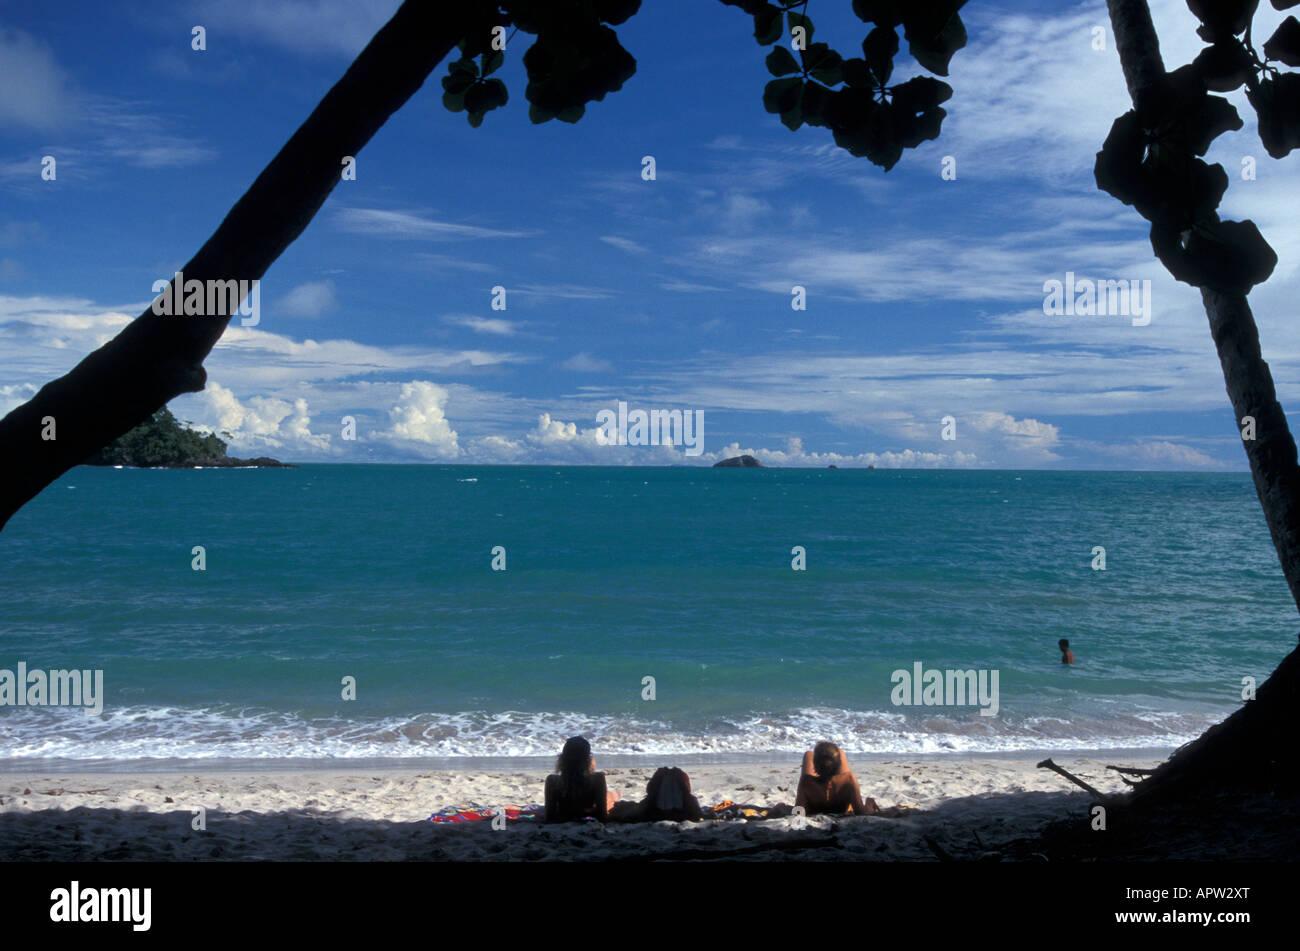 young-women-tourists-relaxing-on-third-beach-in-manuel-antonio-national-APW2XT.jpg